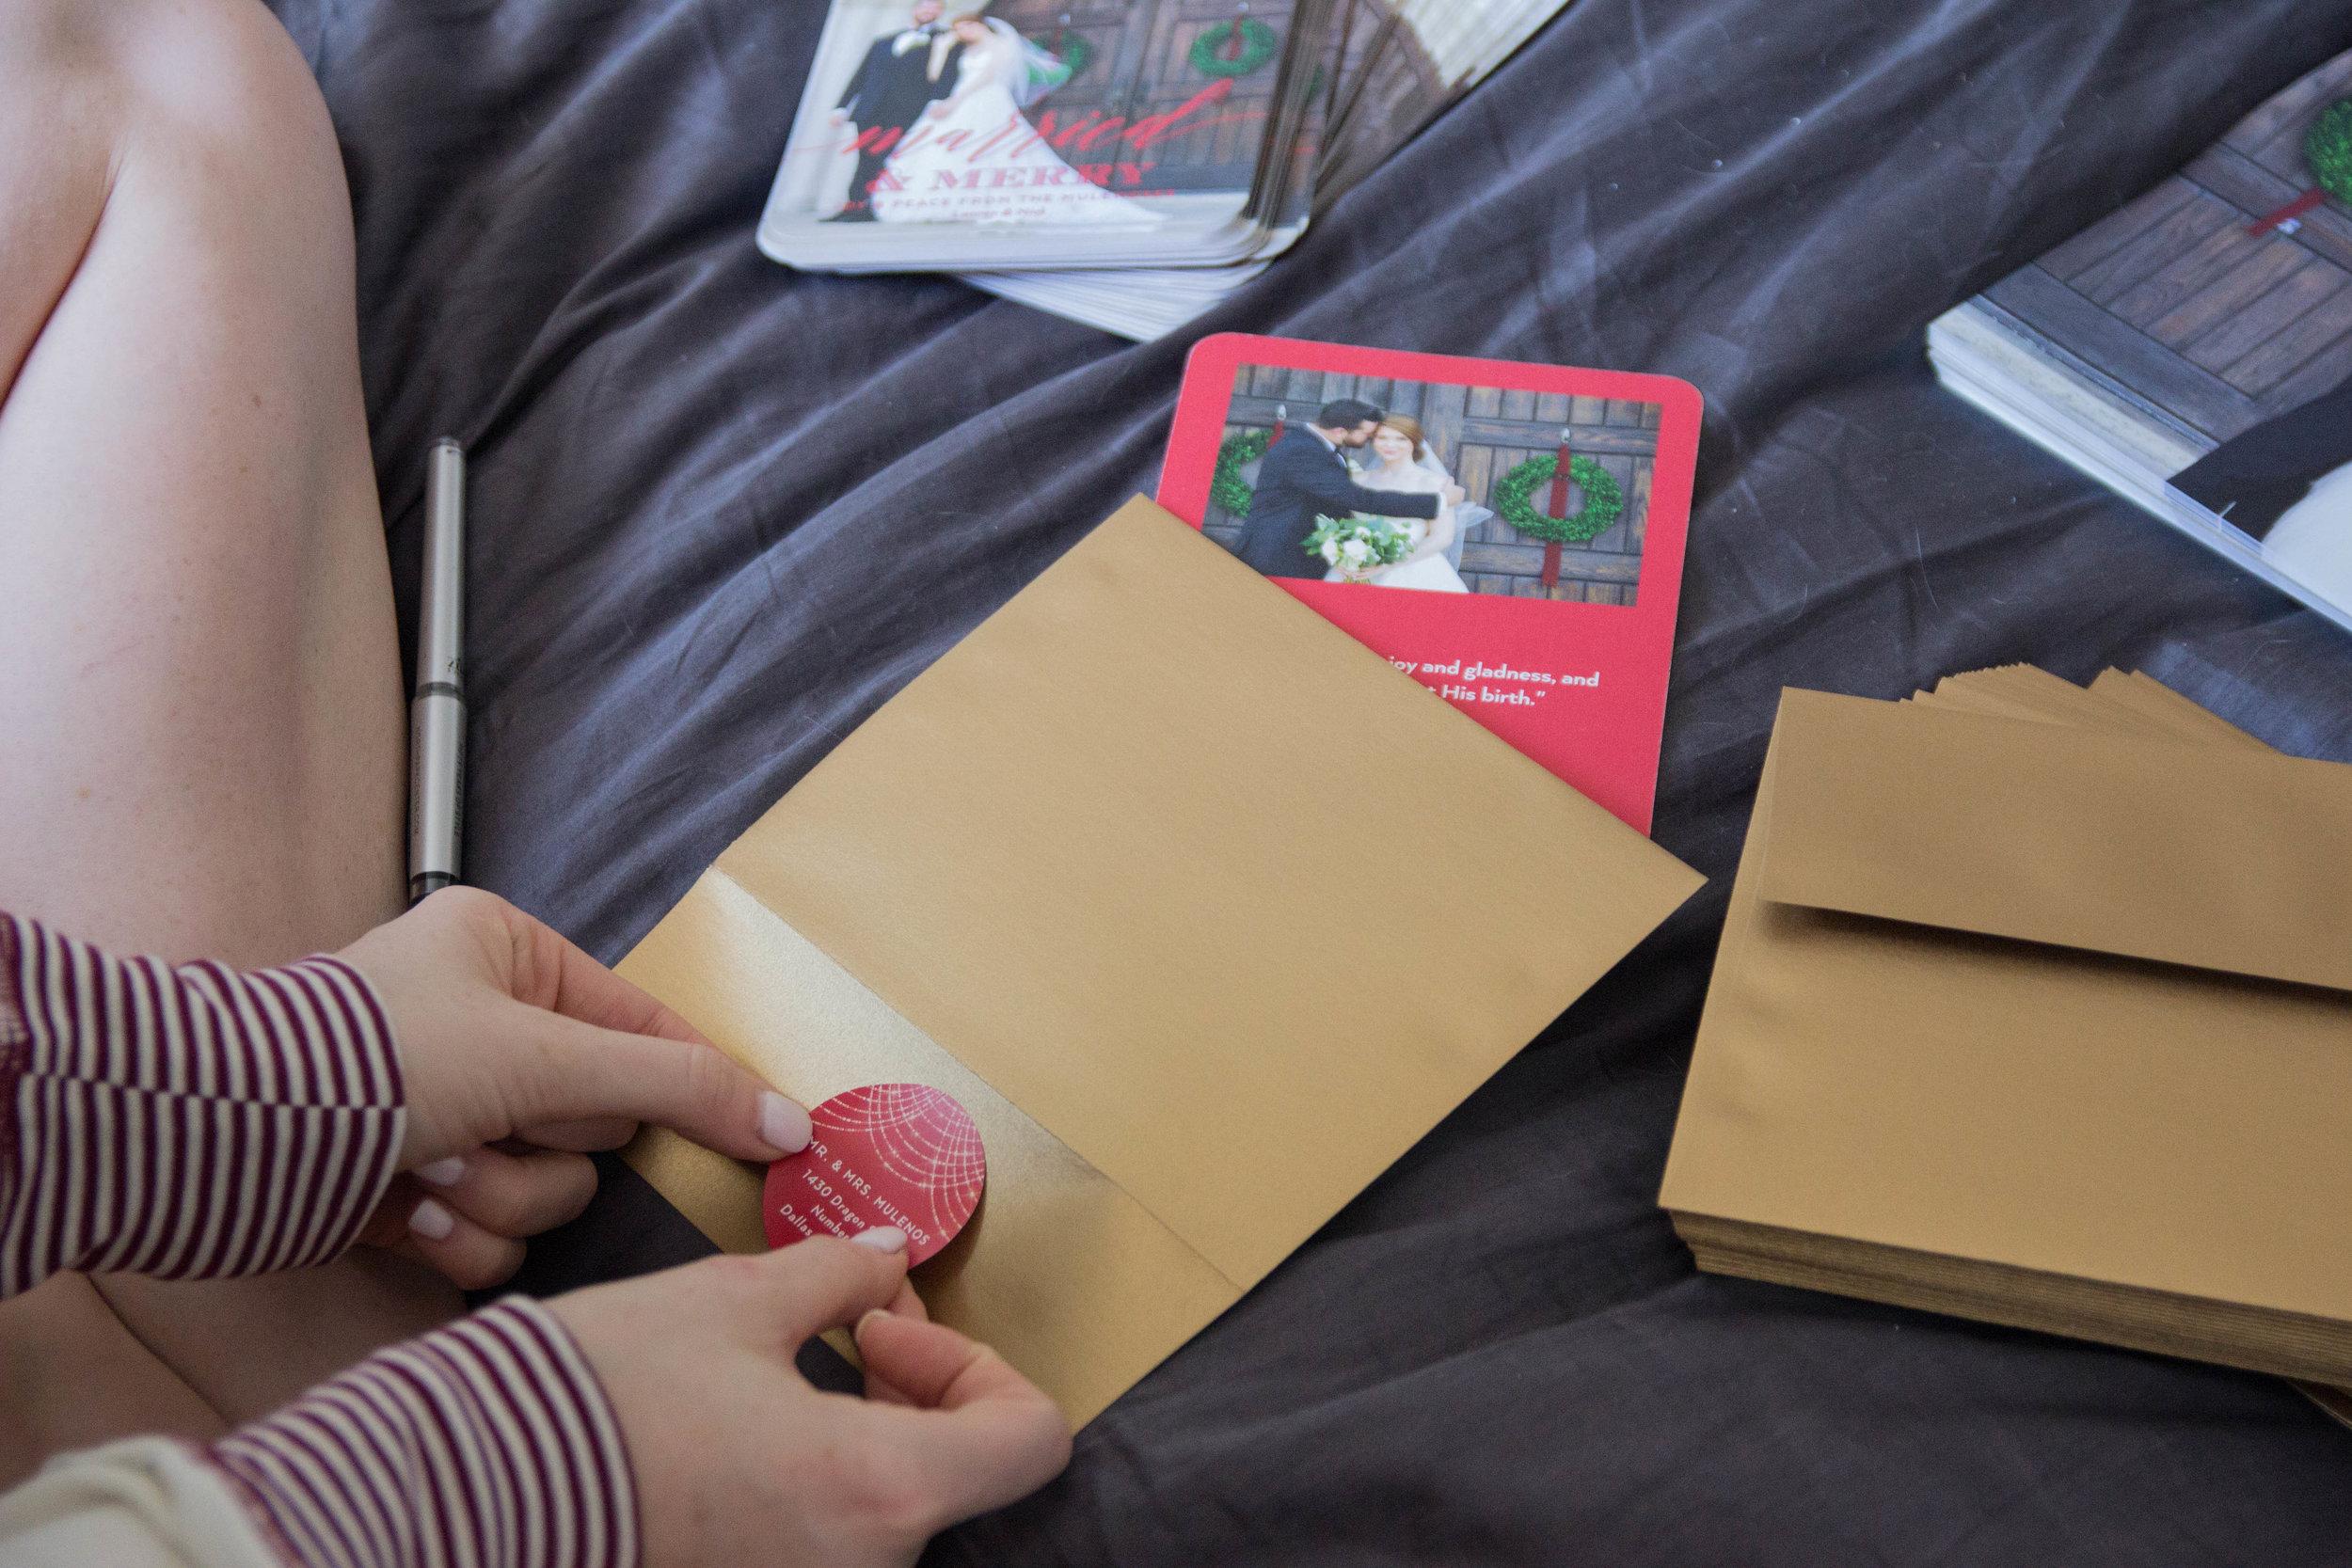 tiny prints, newlywed christmas cards, online christmas card shop, wedding photo cards, parachute home bedding, reindeer pajamas, photo envelope liner, fuzzy pillows, california king bed, always choose joy mug